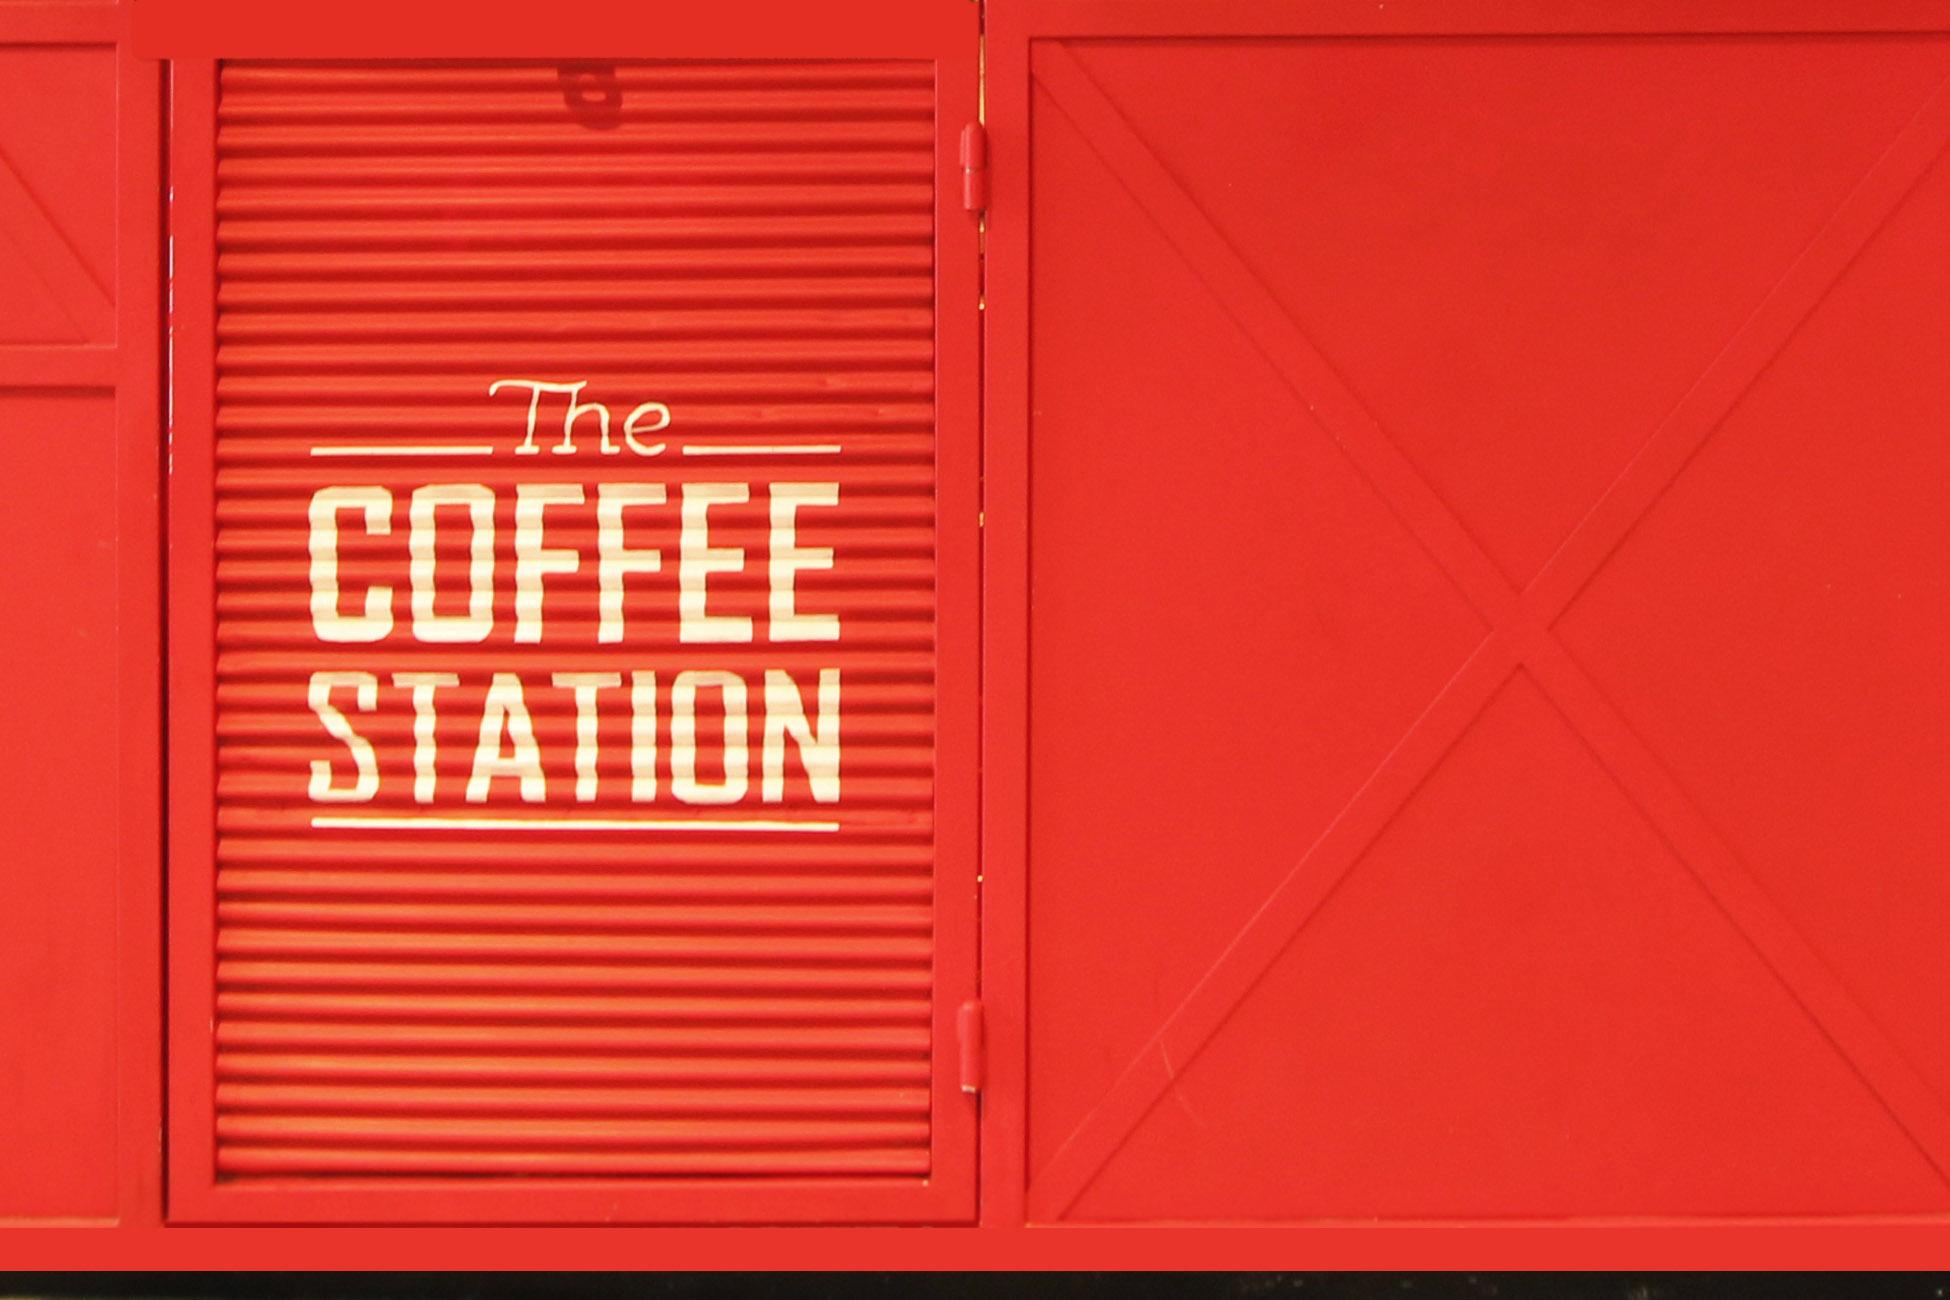 6_CoffeeStation_Sarona.jpg